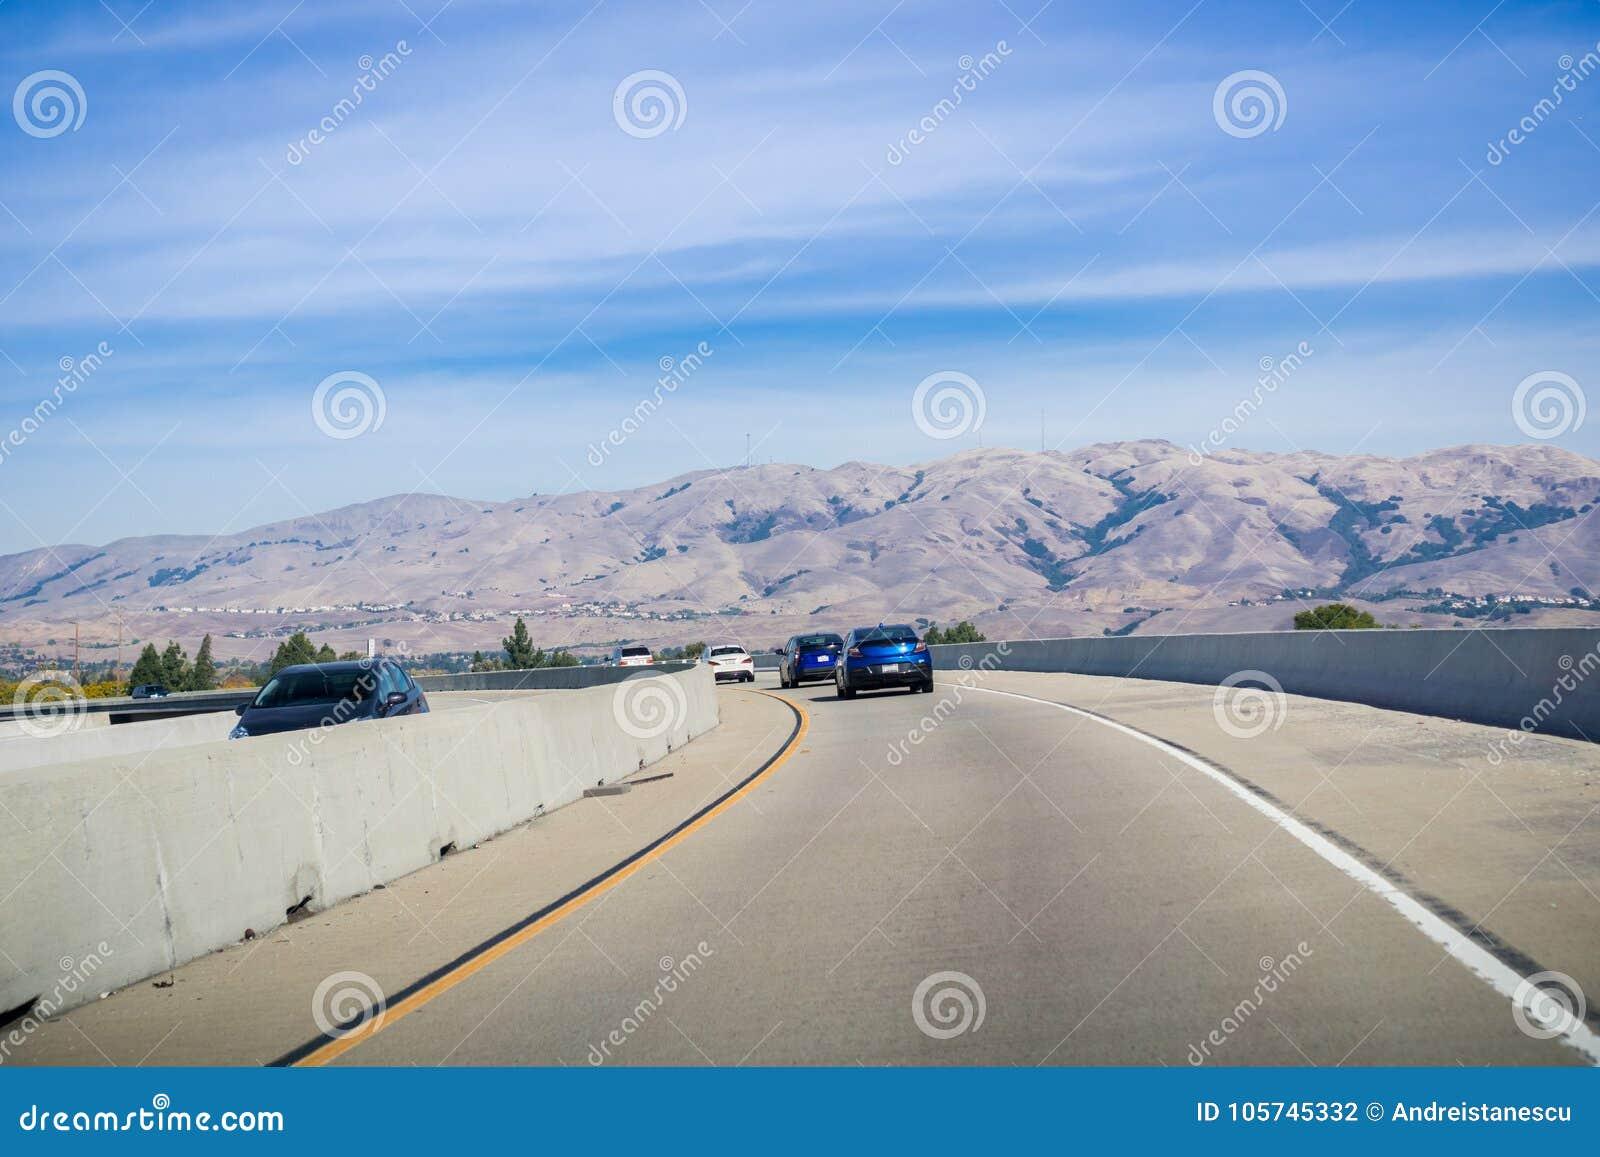 Express Lane California >> Driving On The Express Lane To Switch Between Highways Stock